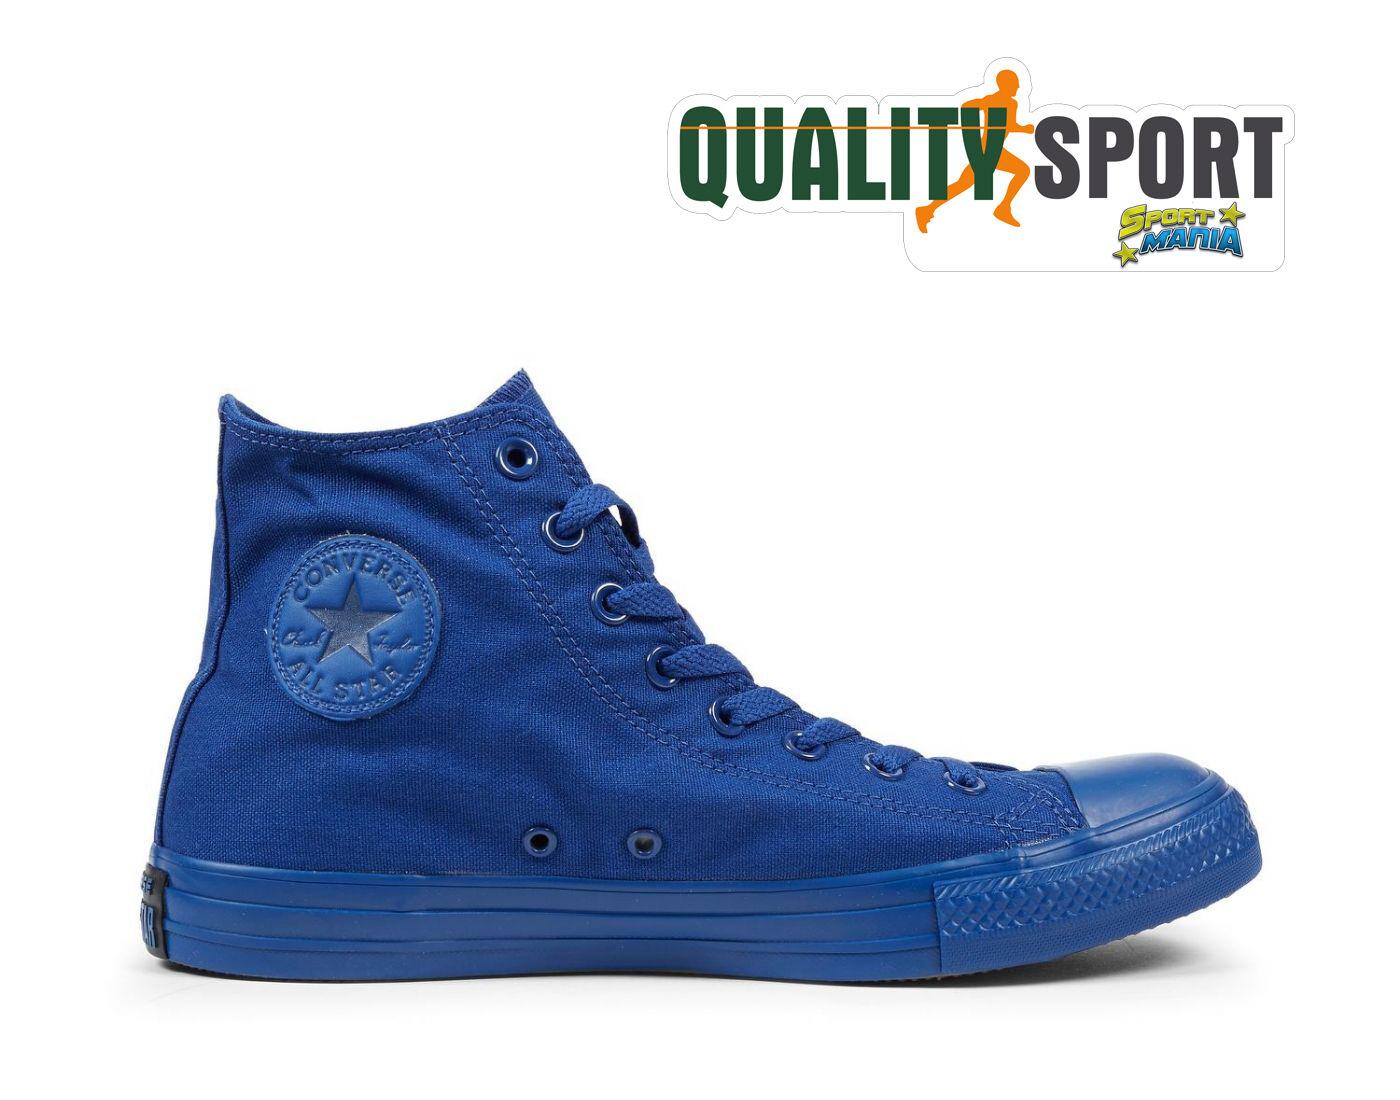 Converse All Star Sportive CT Hi Monochrome Blu Scarpe Sportive Star Baskets 152703C 3686ad